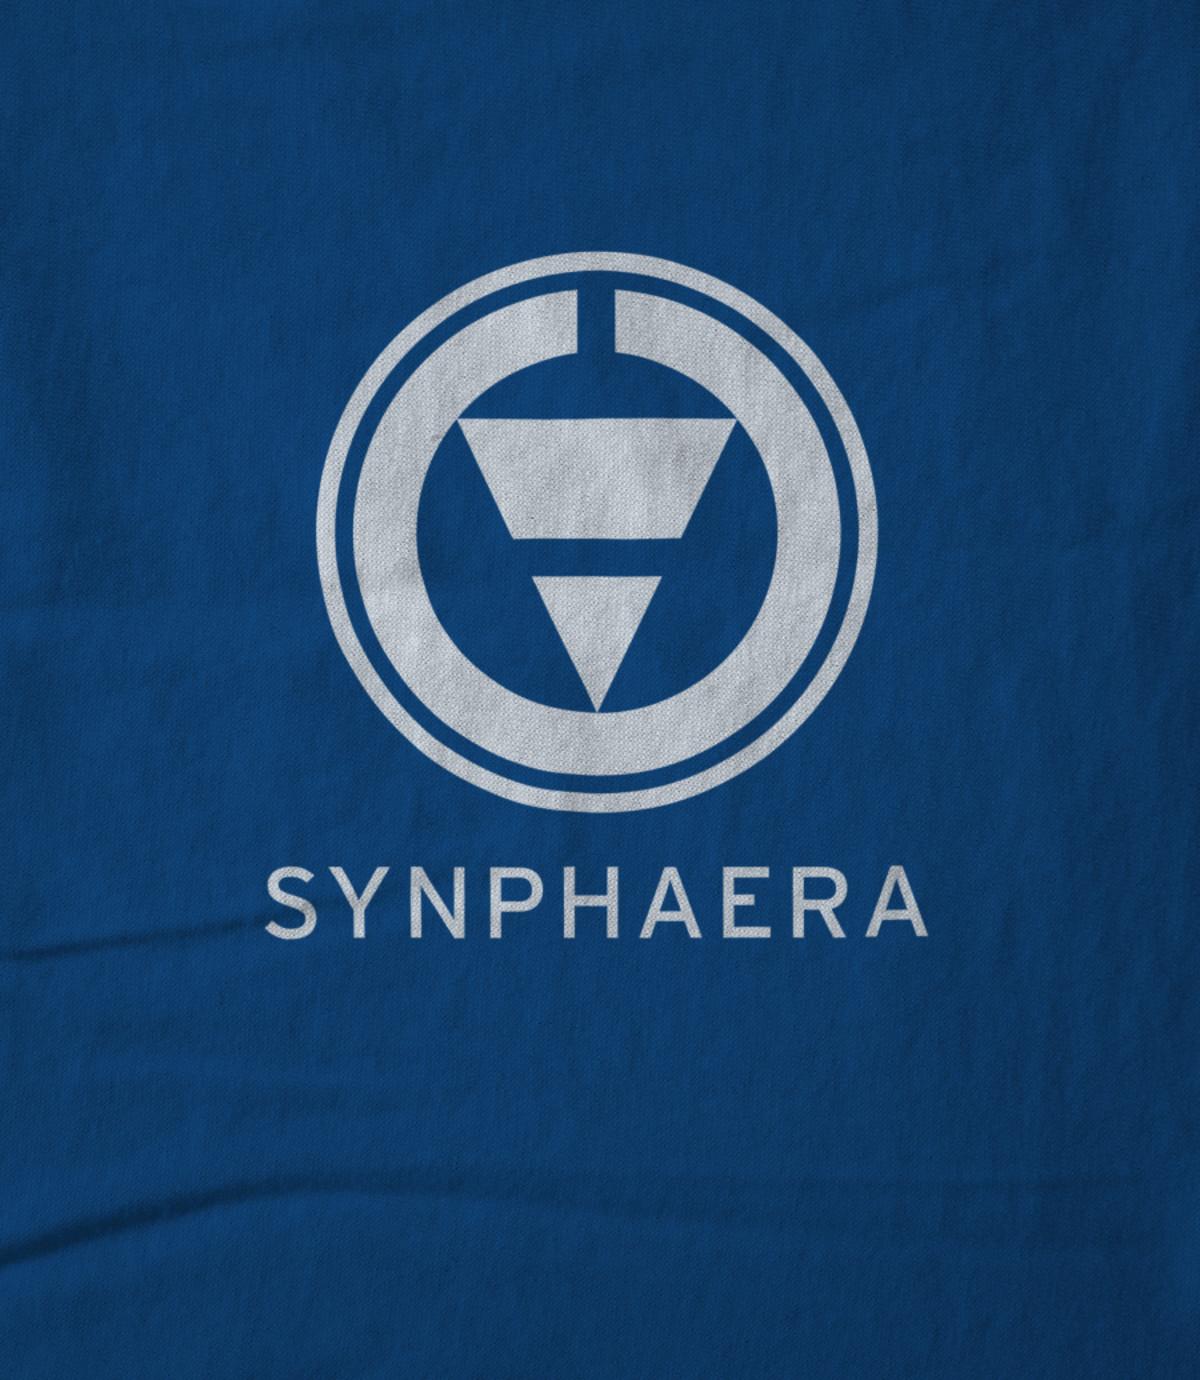 Synphaera records official synphaera